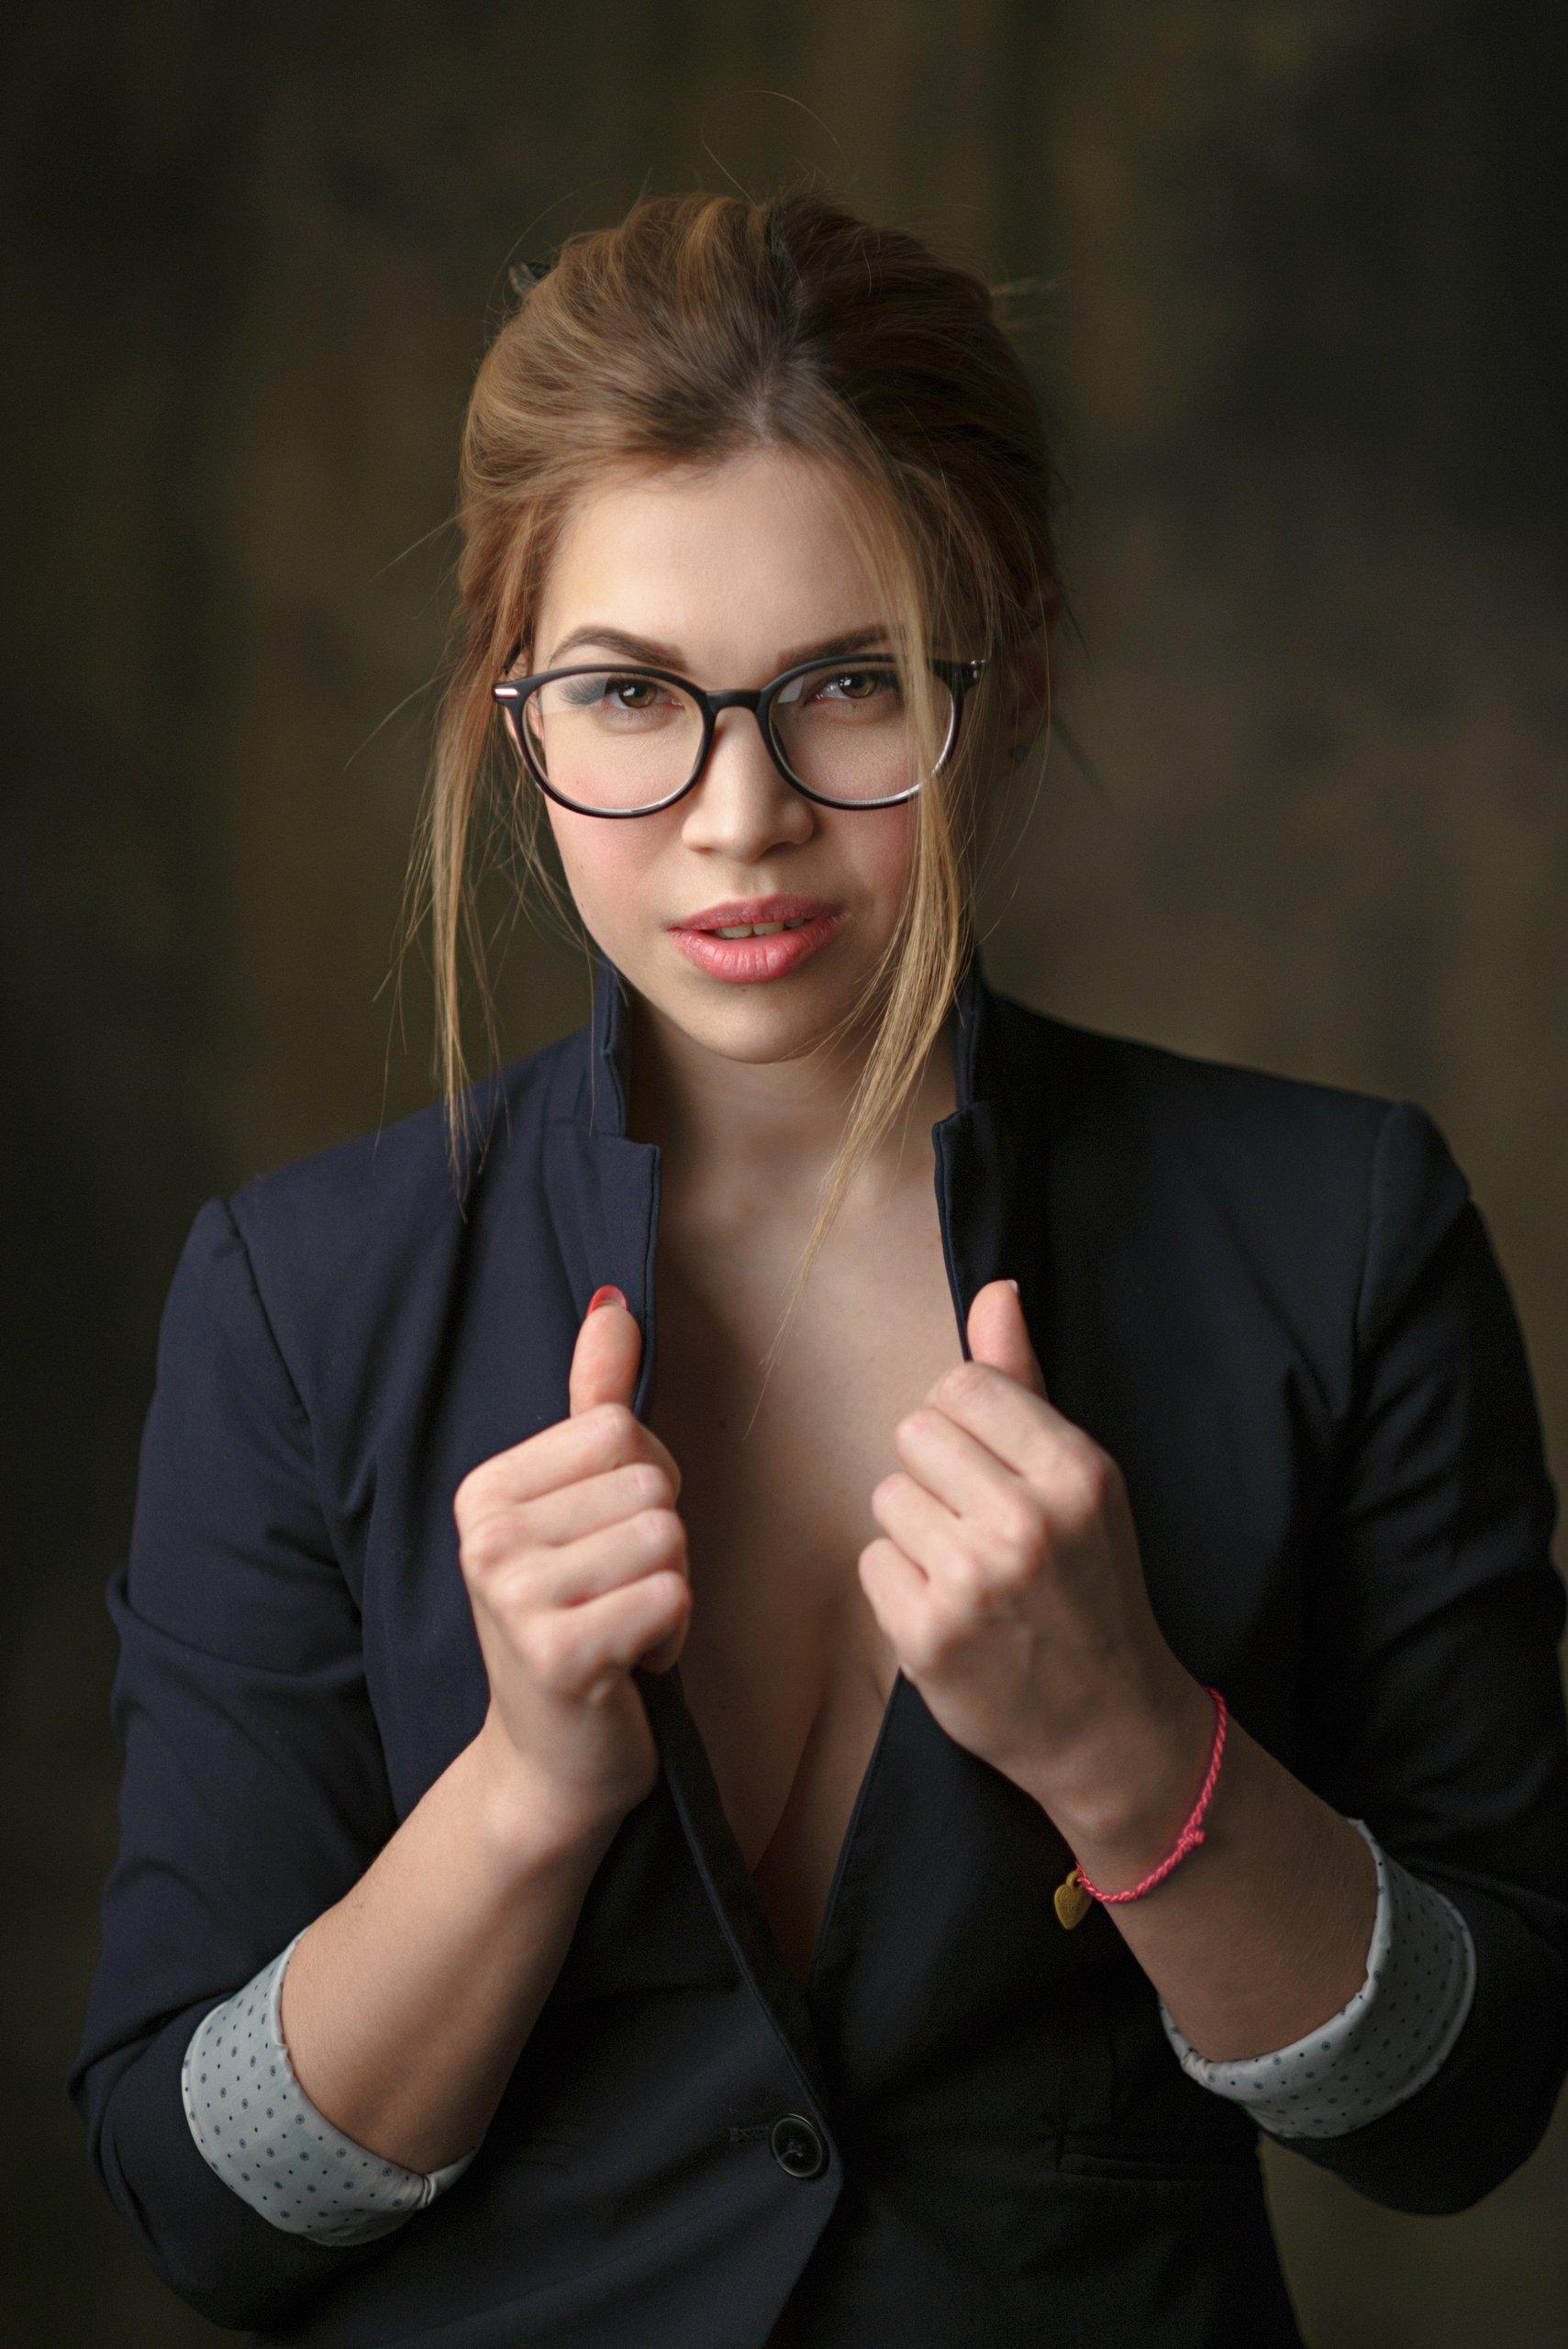 Svetlana,portrait,girl,, Черепко Павел